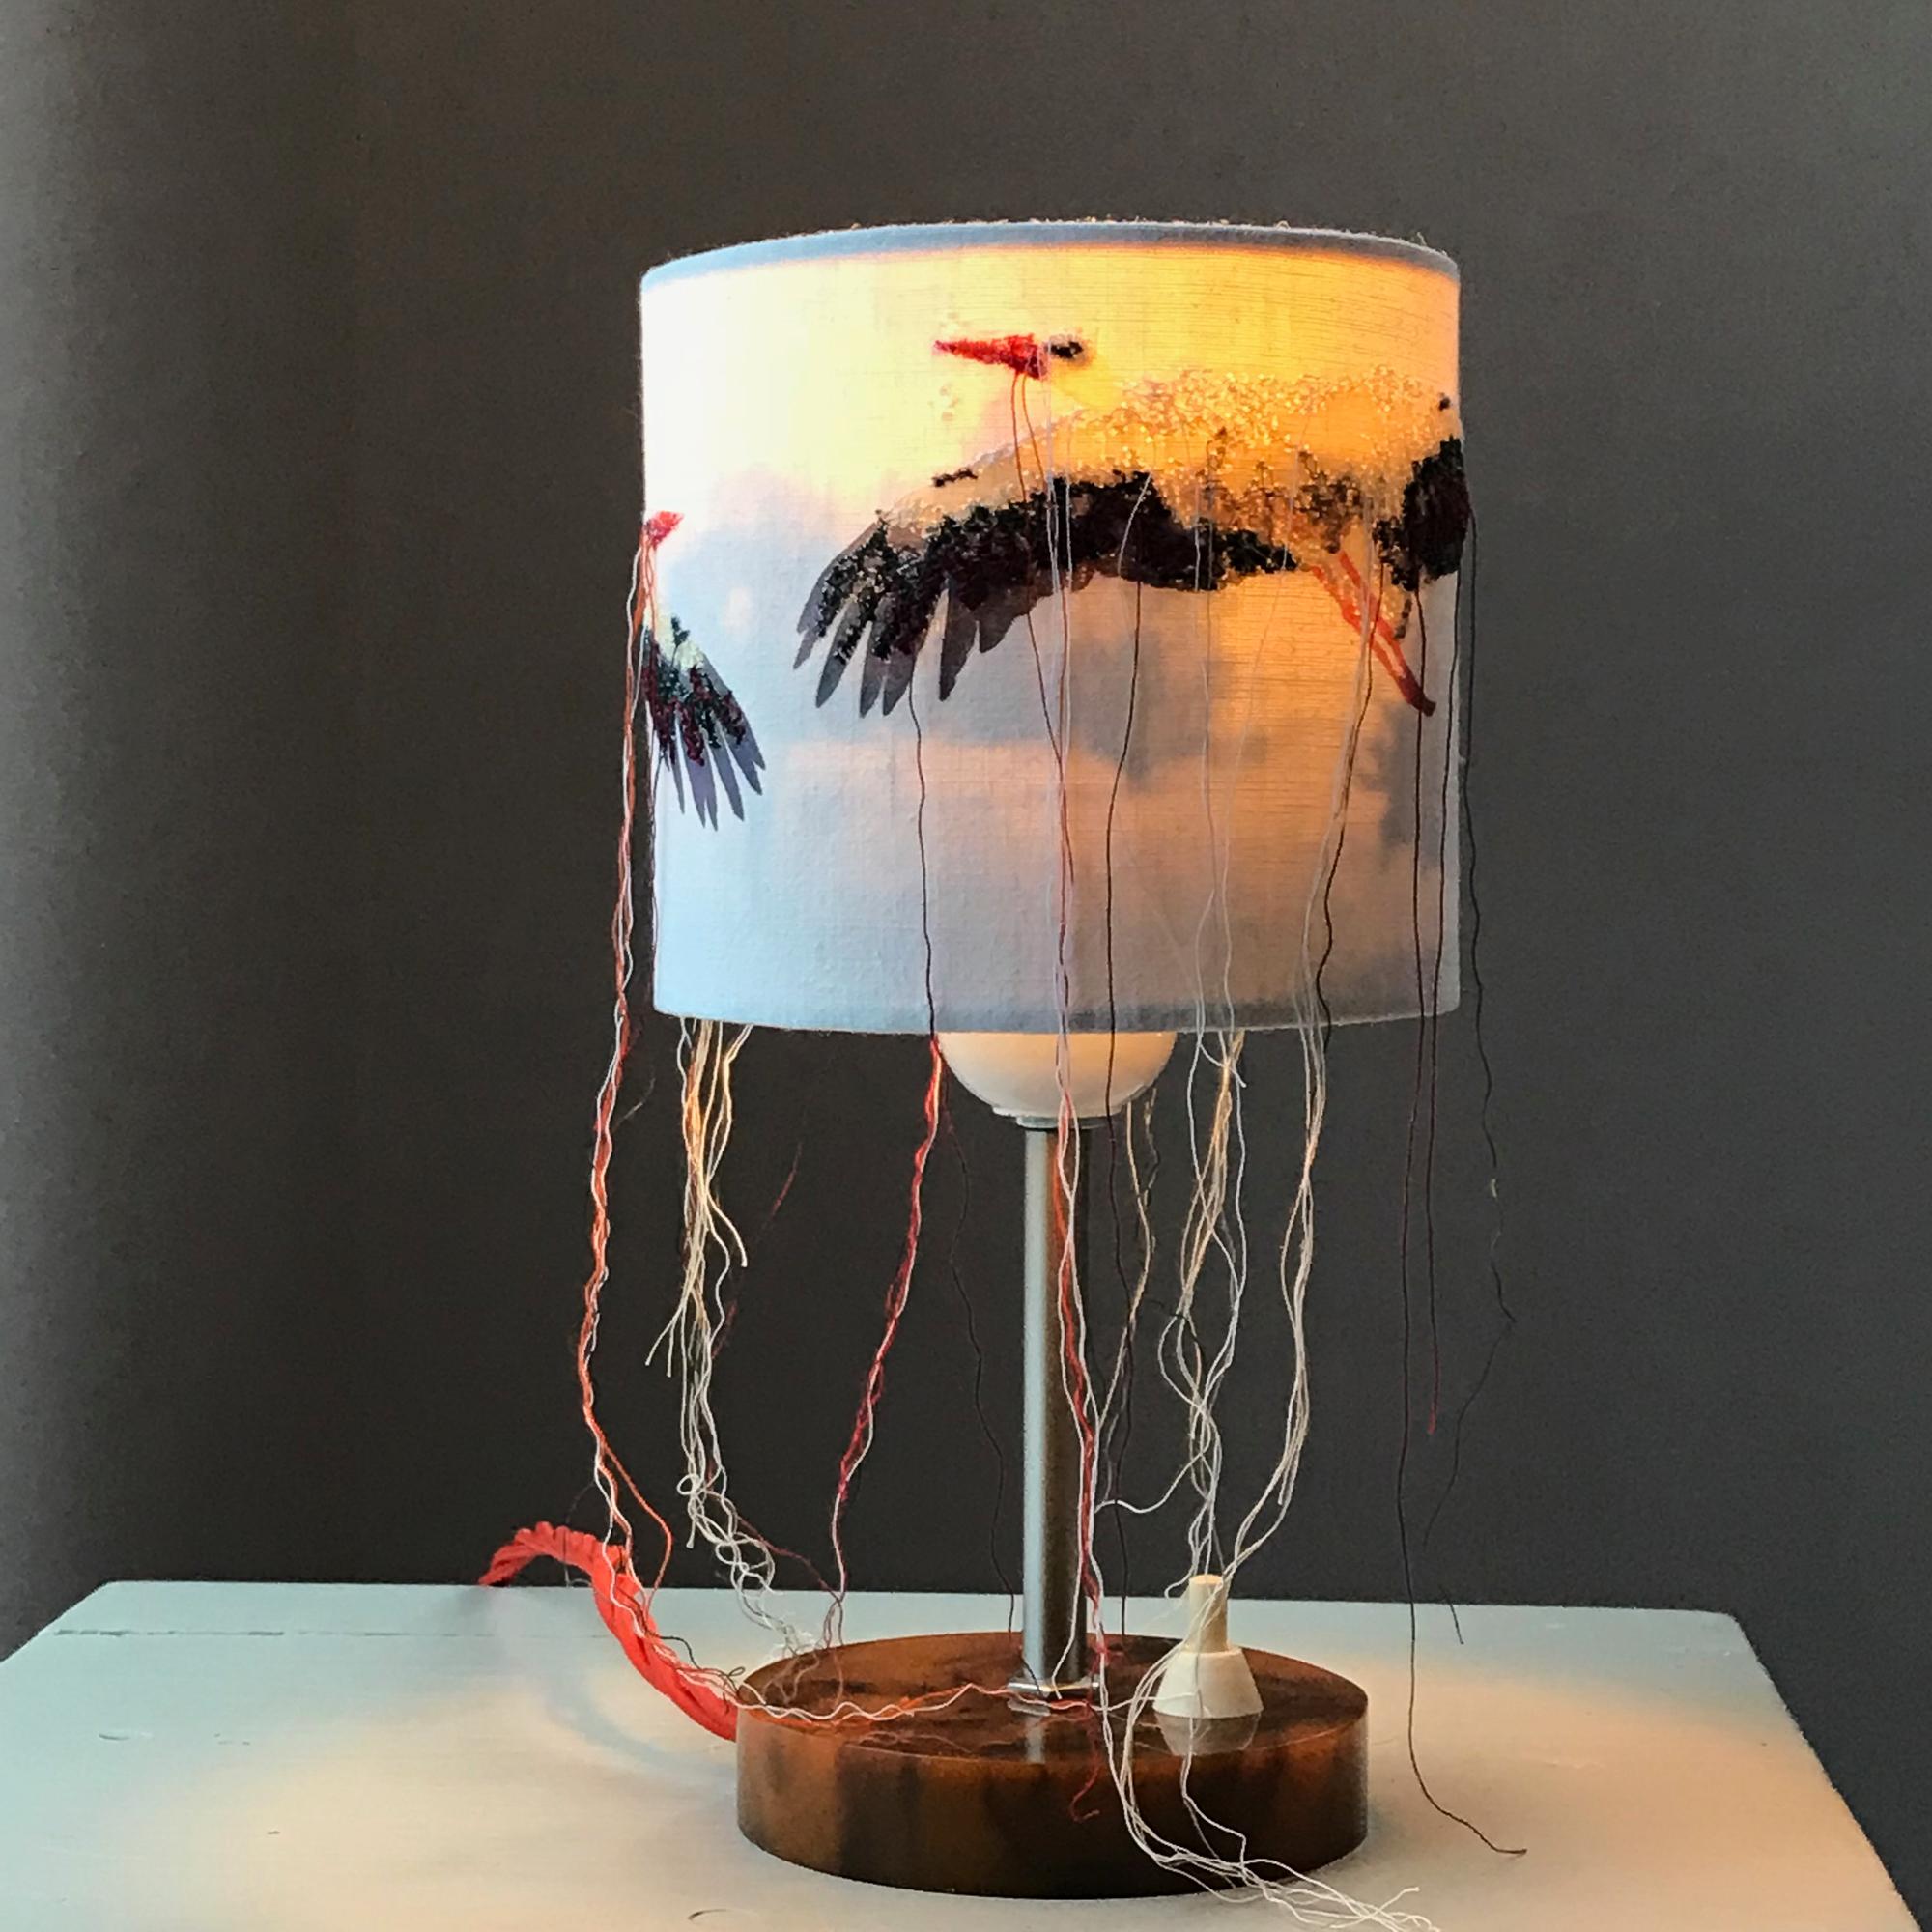 marte_a_mano _Storchlampe, leuchtet